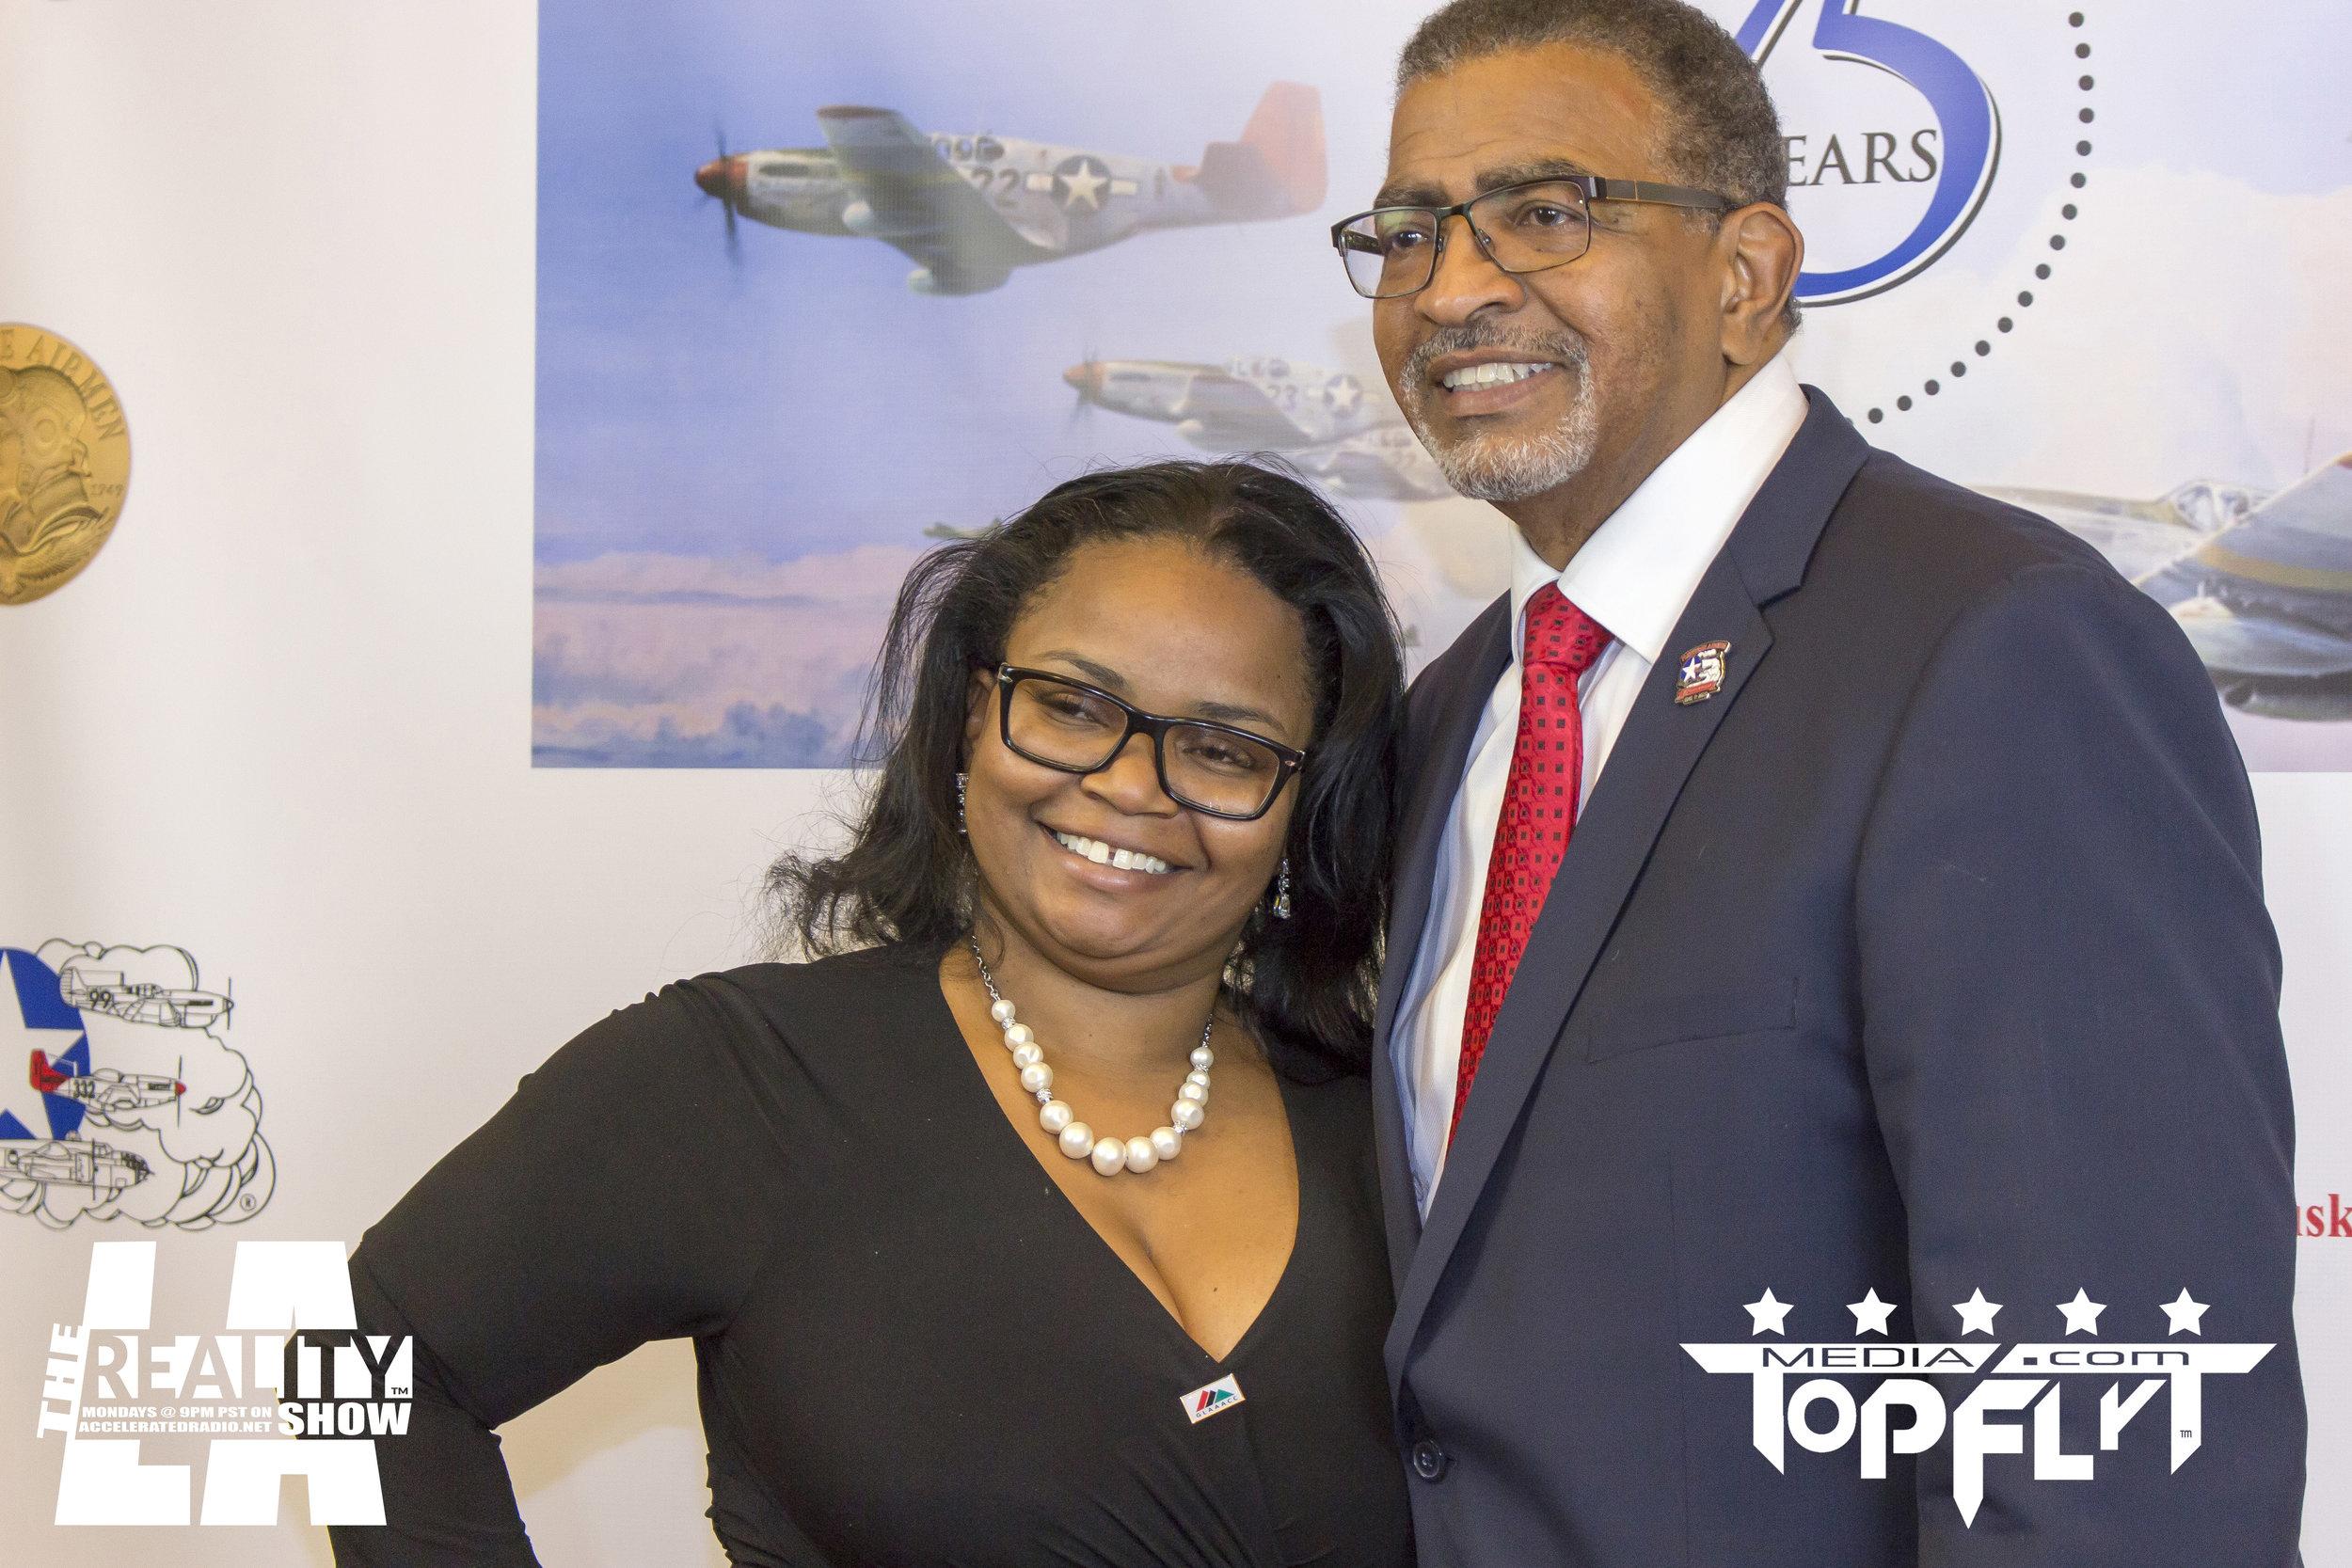 The Reality Show LA - Tuskegee Airmen 75th Anniversary VIP Reception_108.jpg